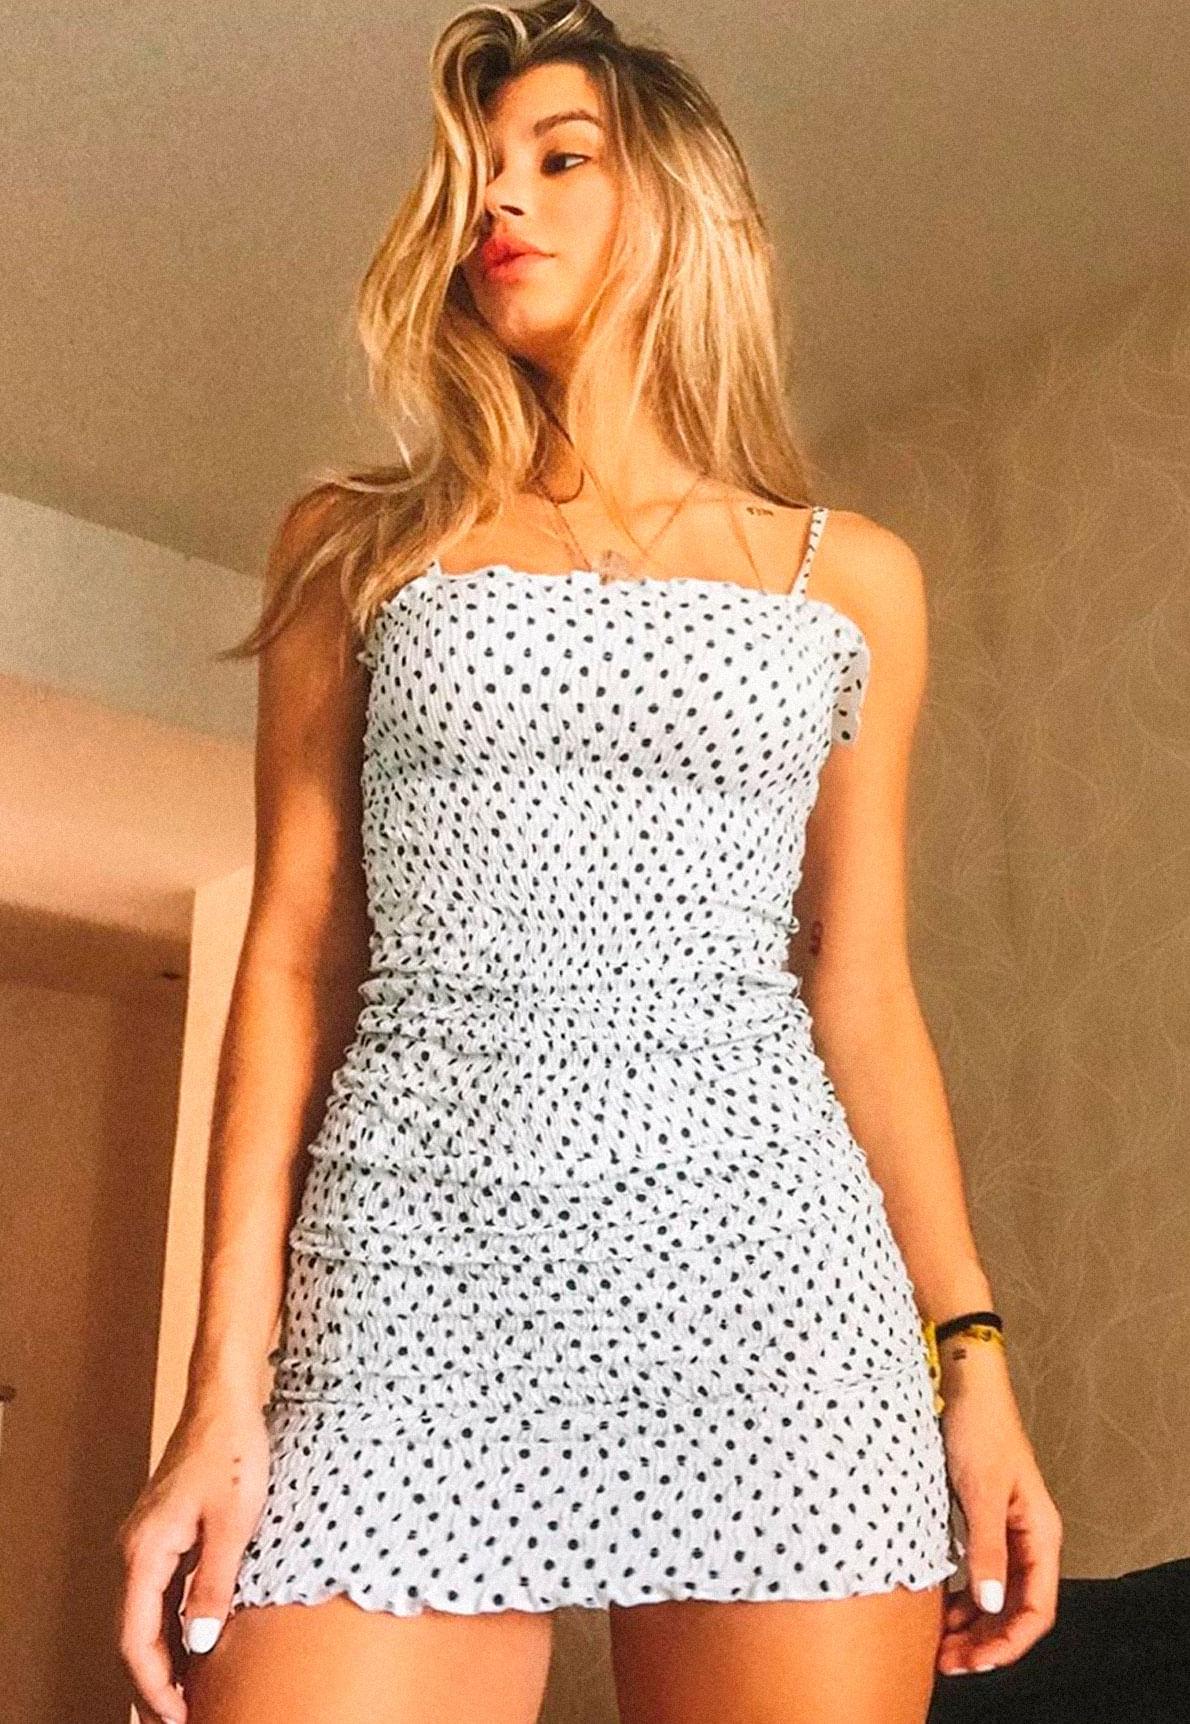 21706-vestido-lastex-poa-branco-bruna-mundo-lolita-06